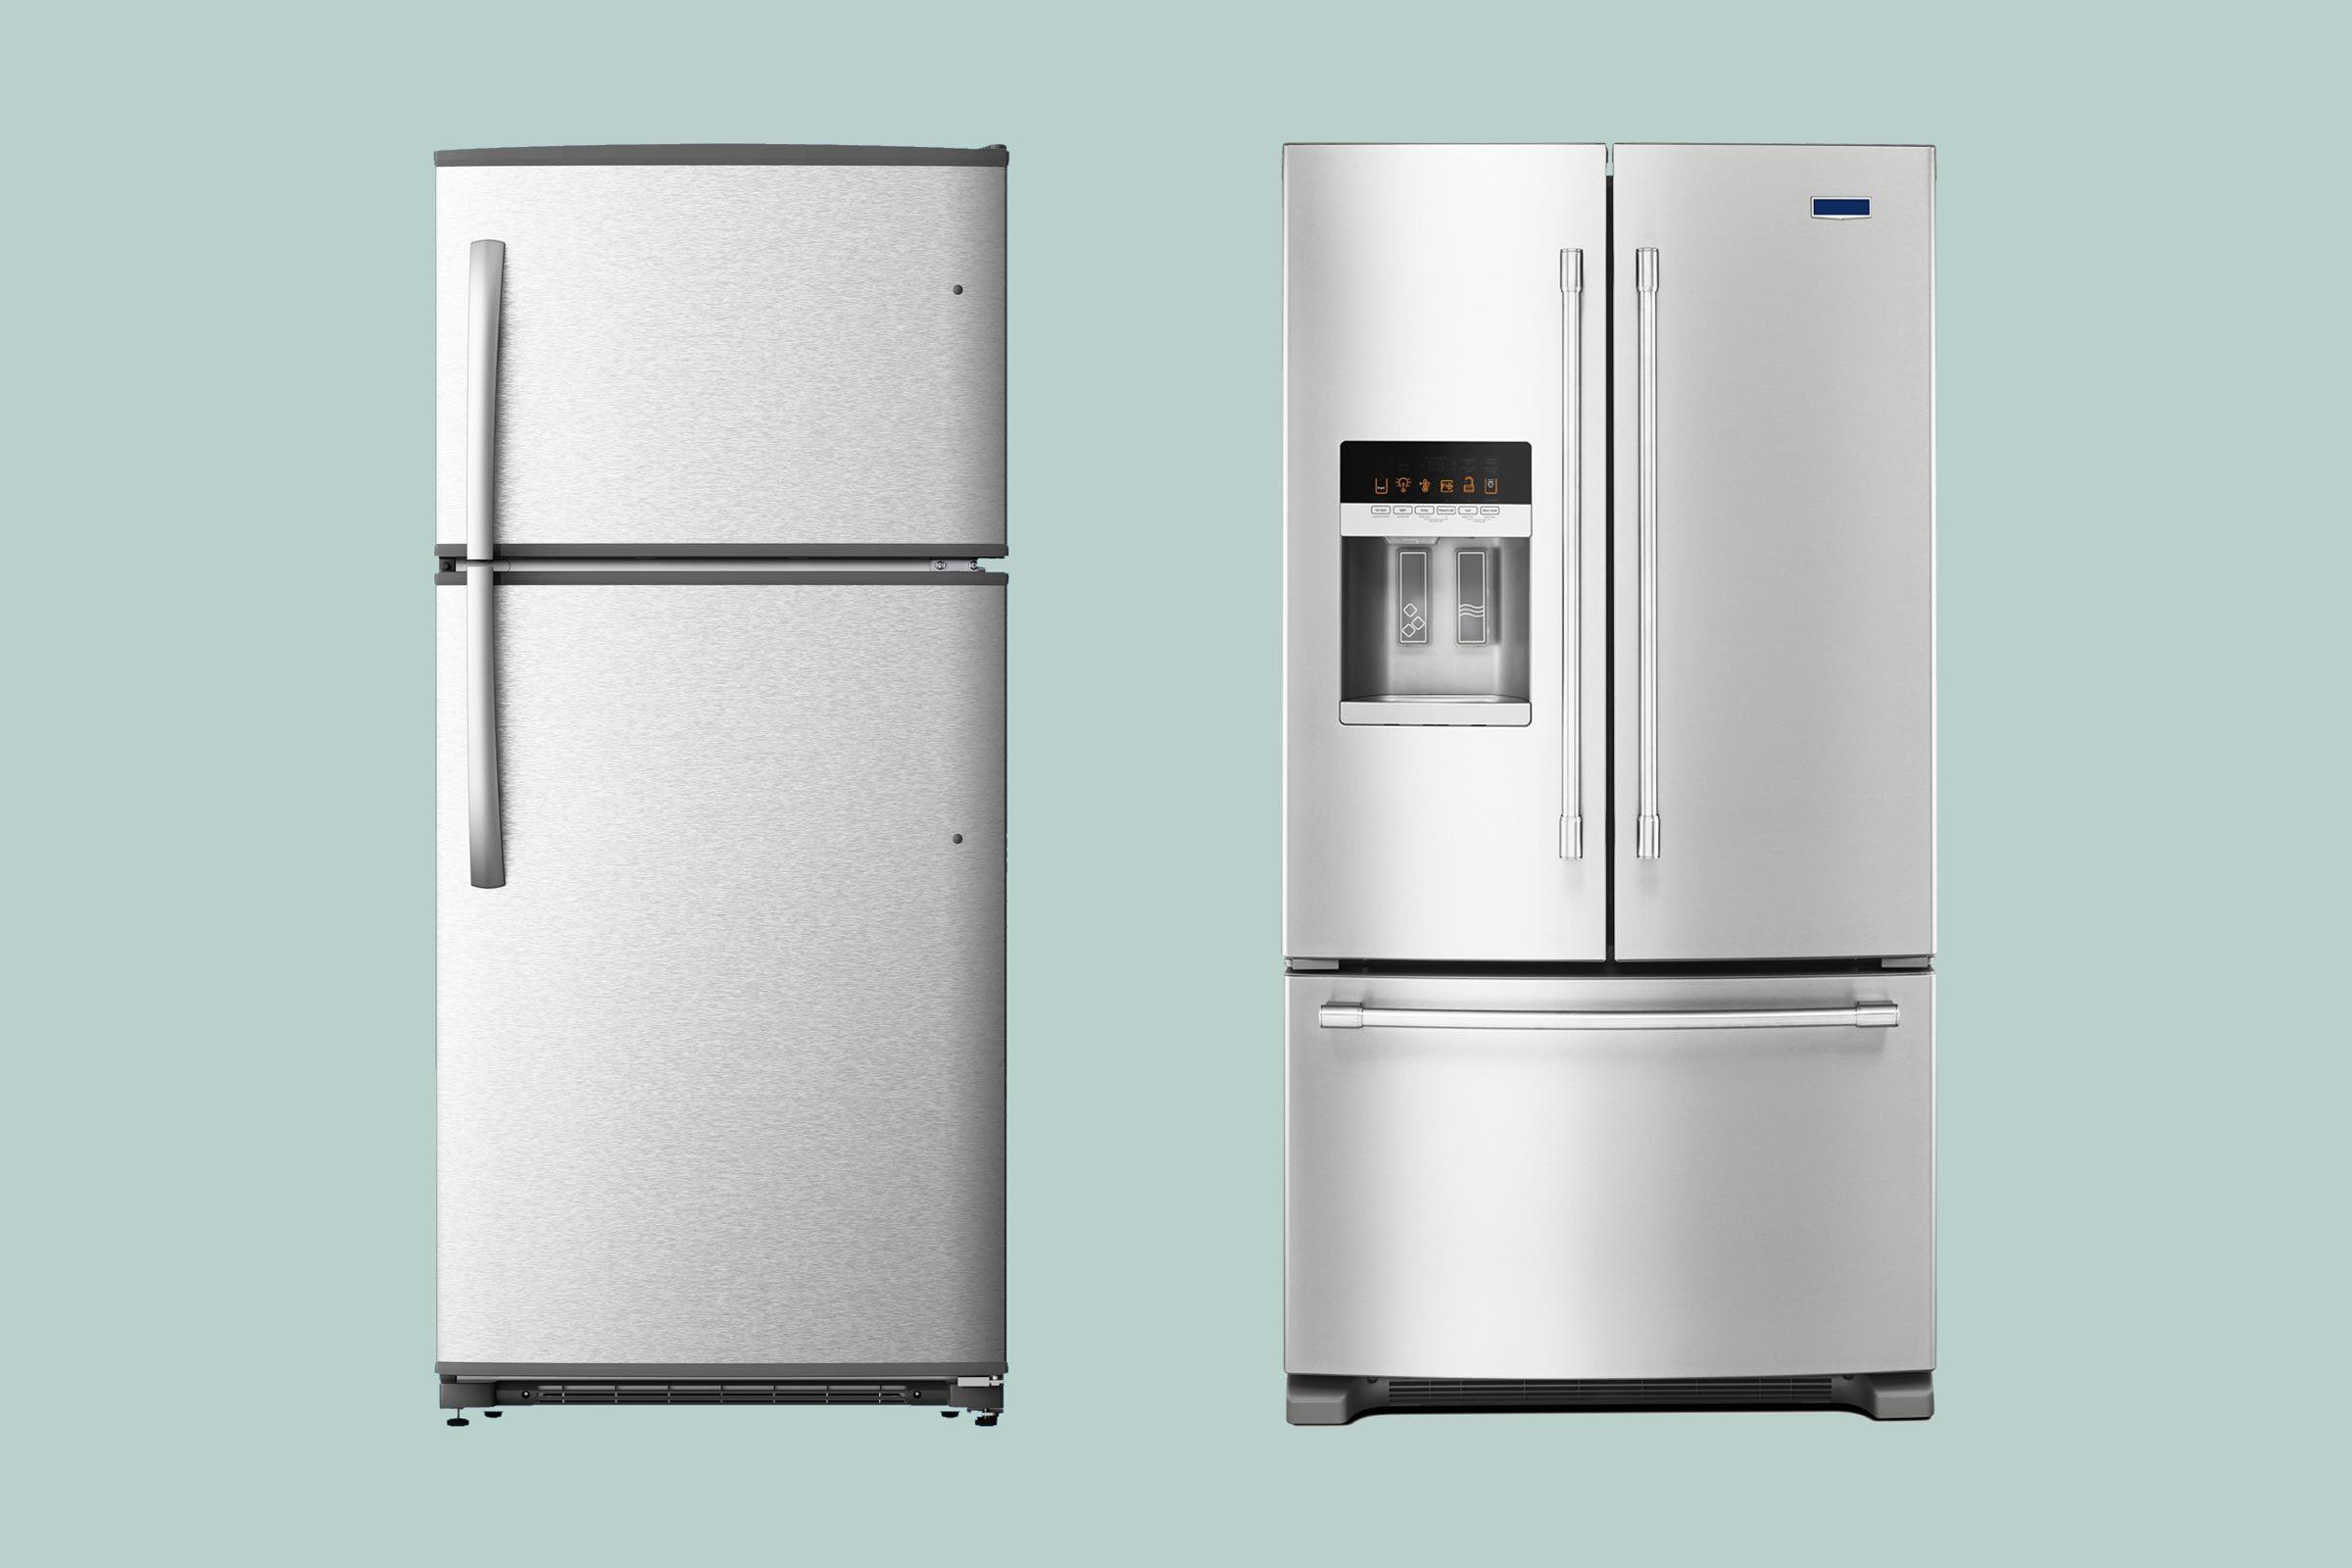 Bottom Freezer Vs Top Freezer Which One S Better Reader S Digest